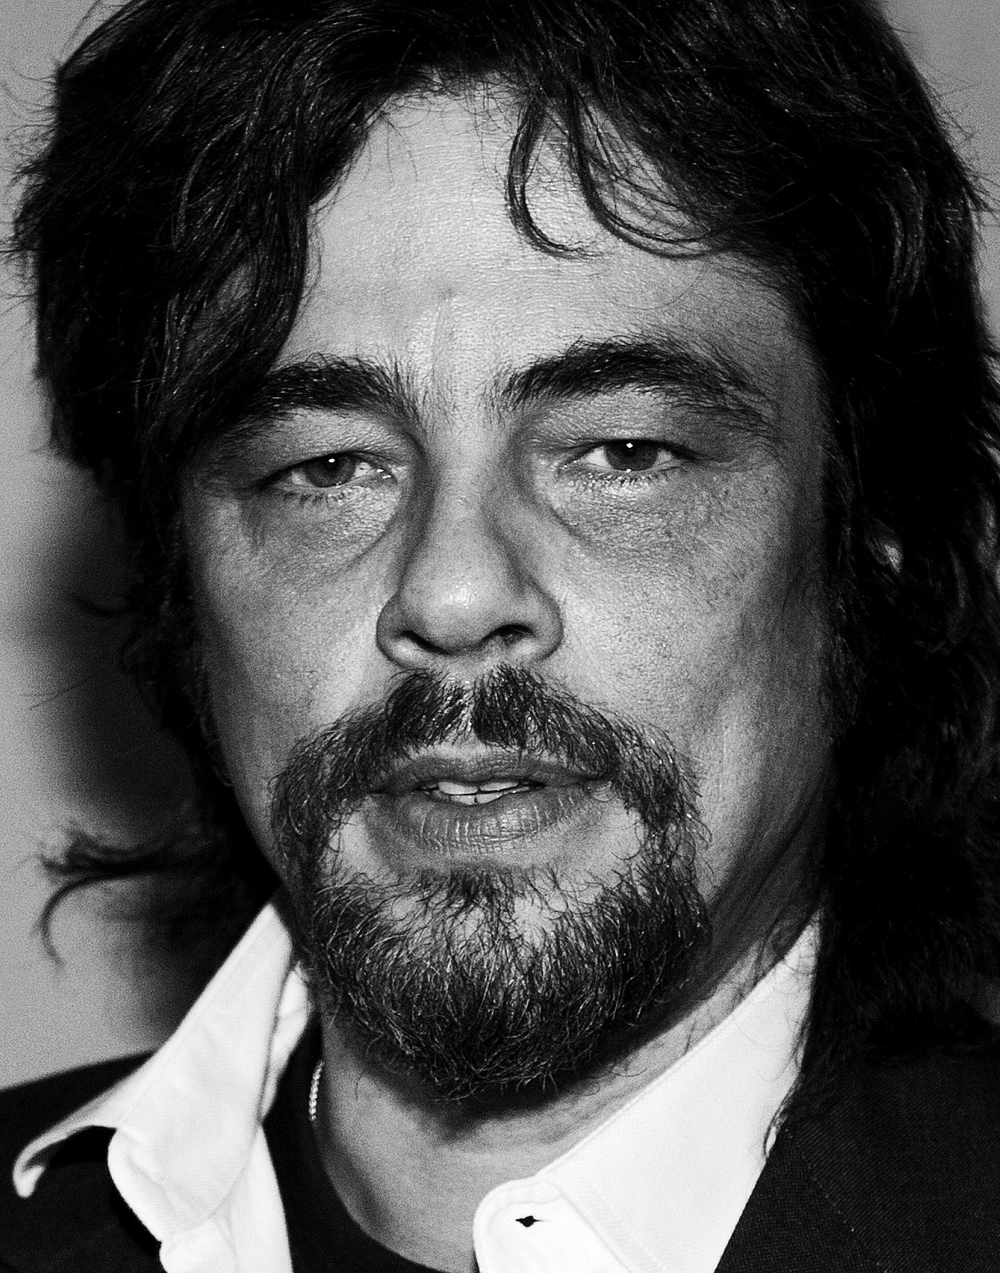 Benicio.jpg